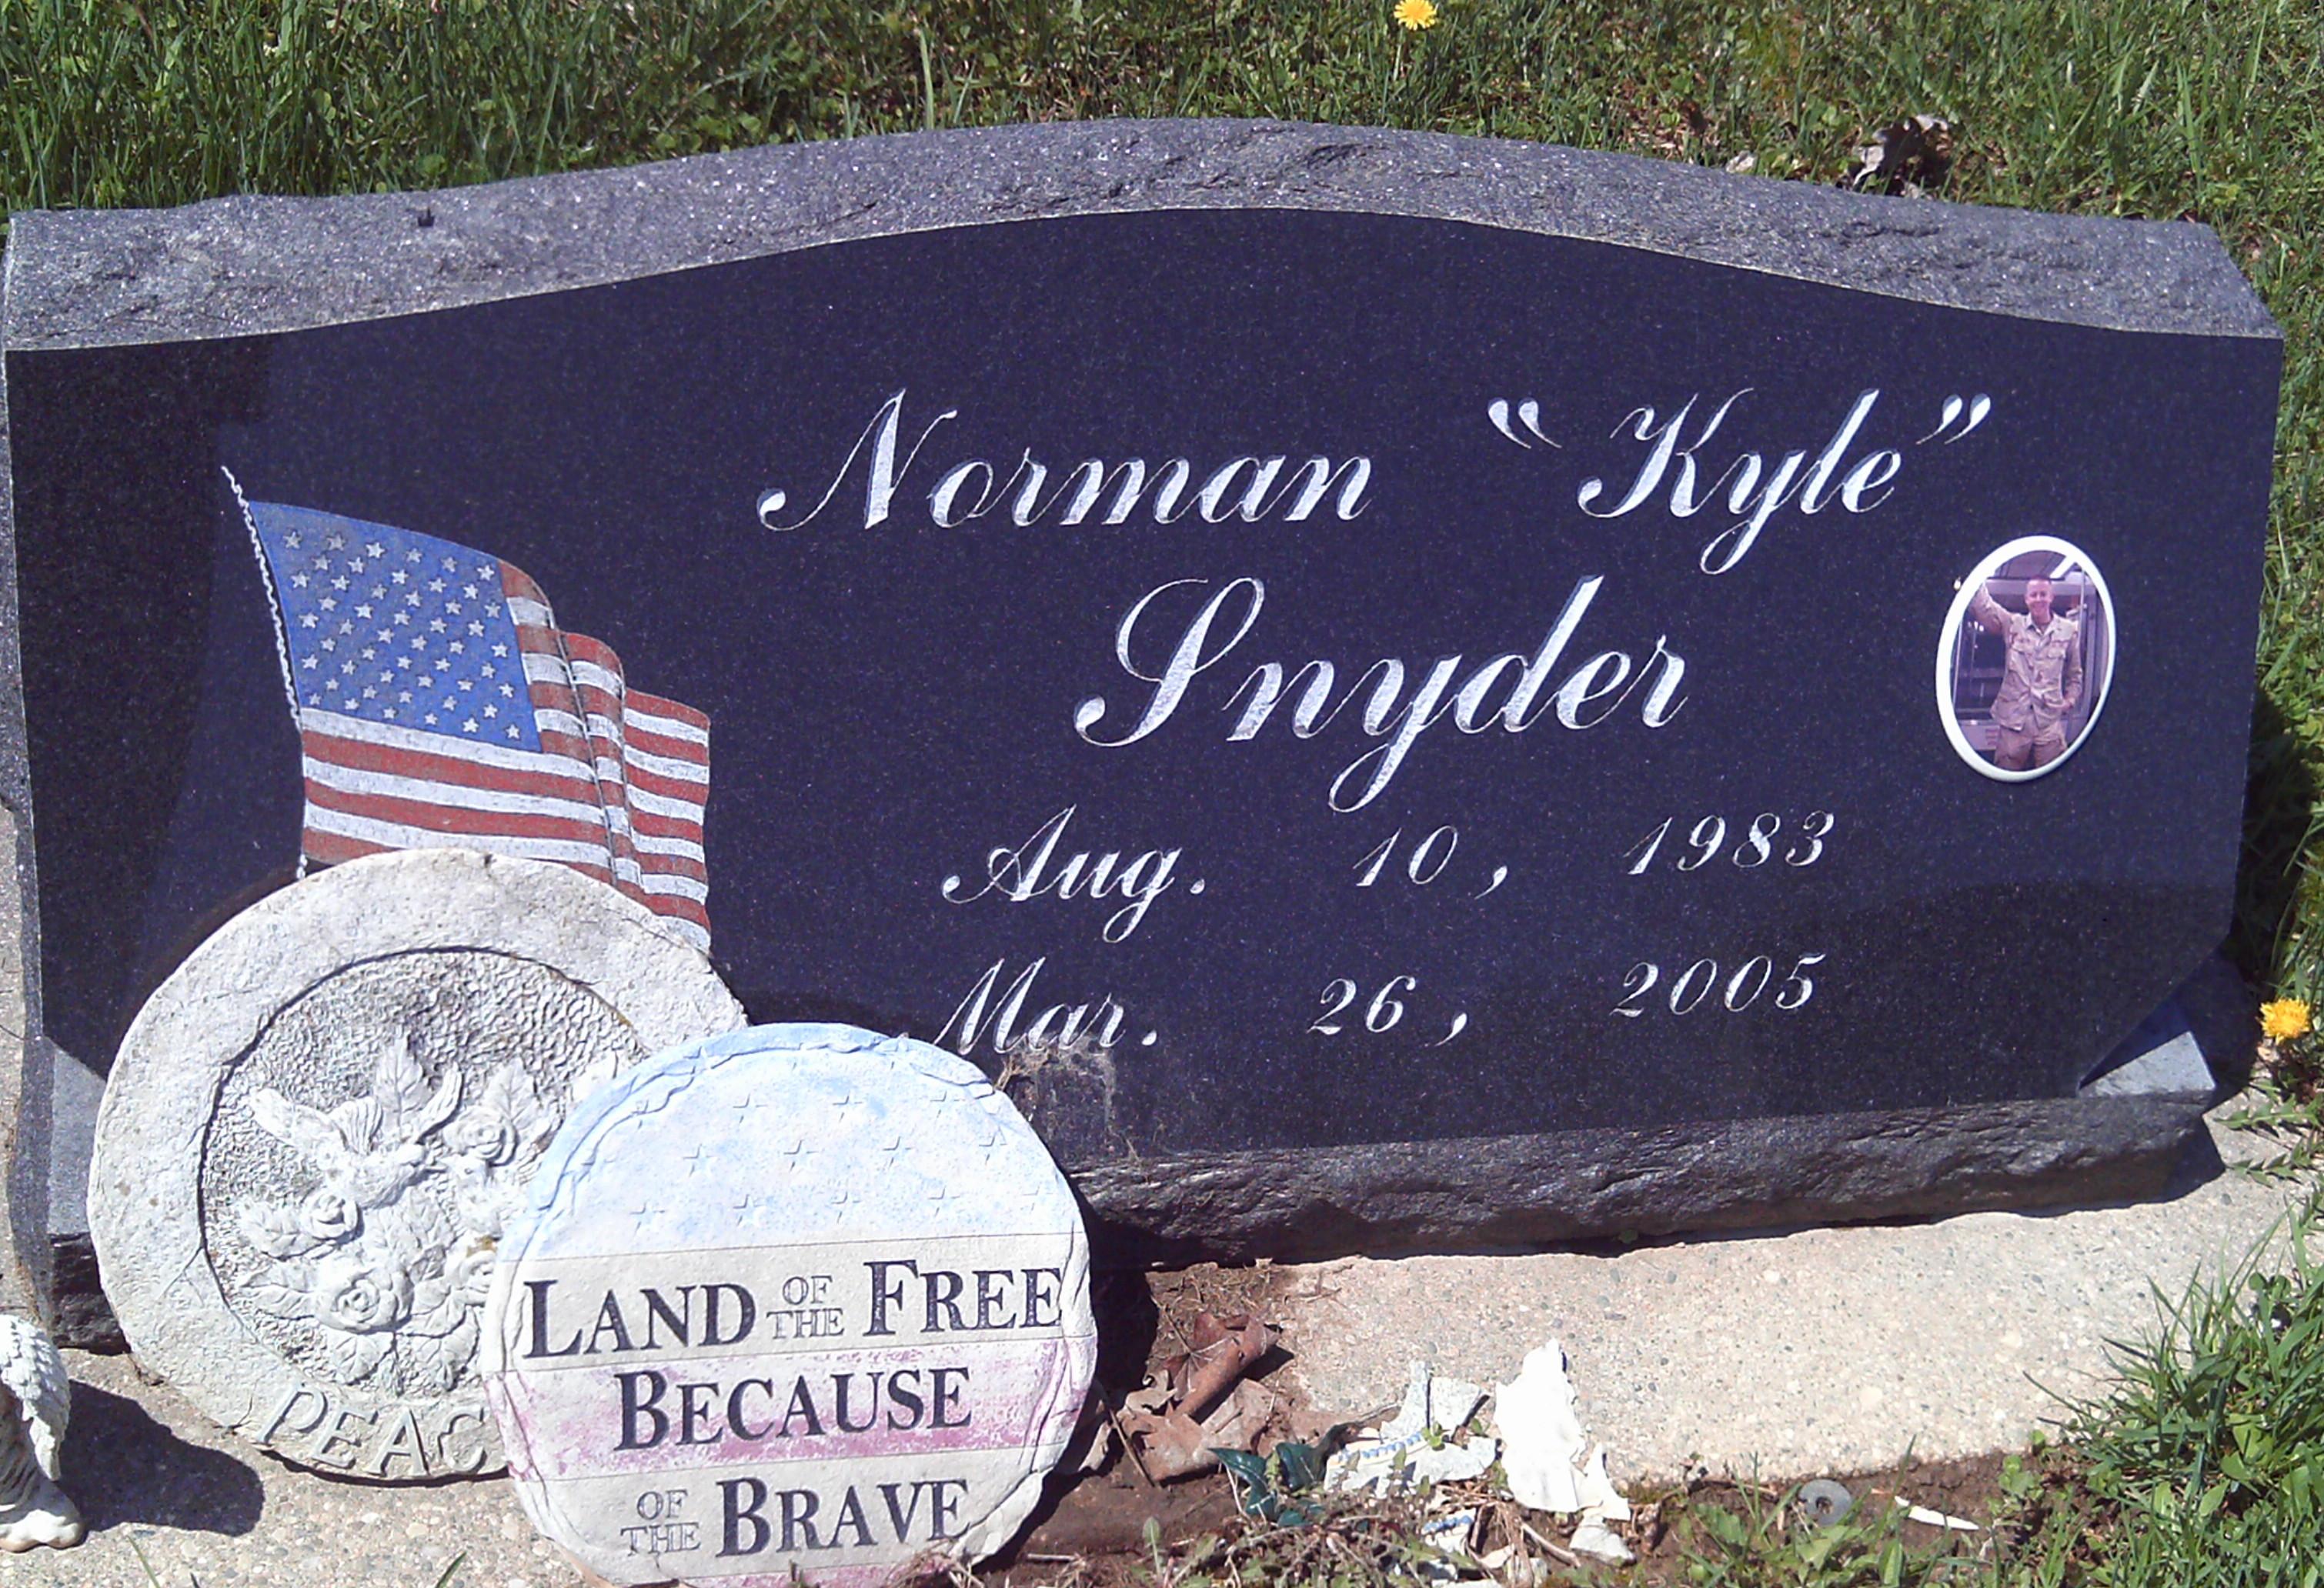 Norman Kyle Snyder